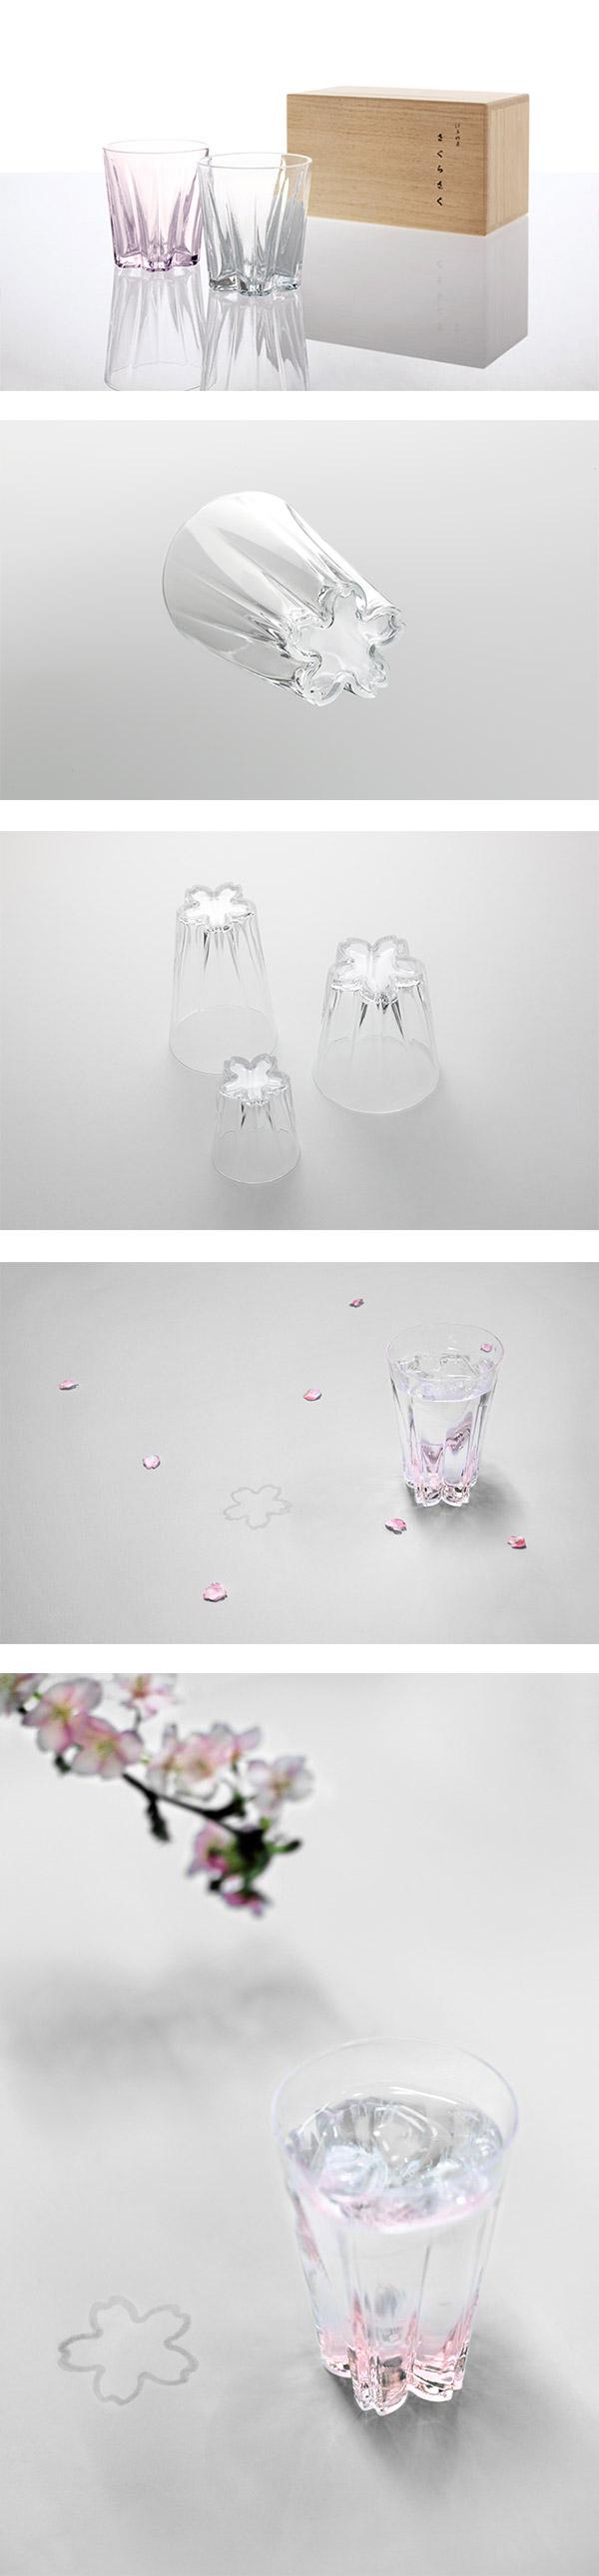 Perrocaliente SAKURASAKU 櫻花杯 雙入同款同色 清酒杯 櫻花粉